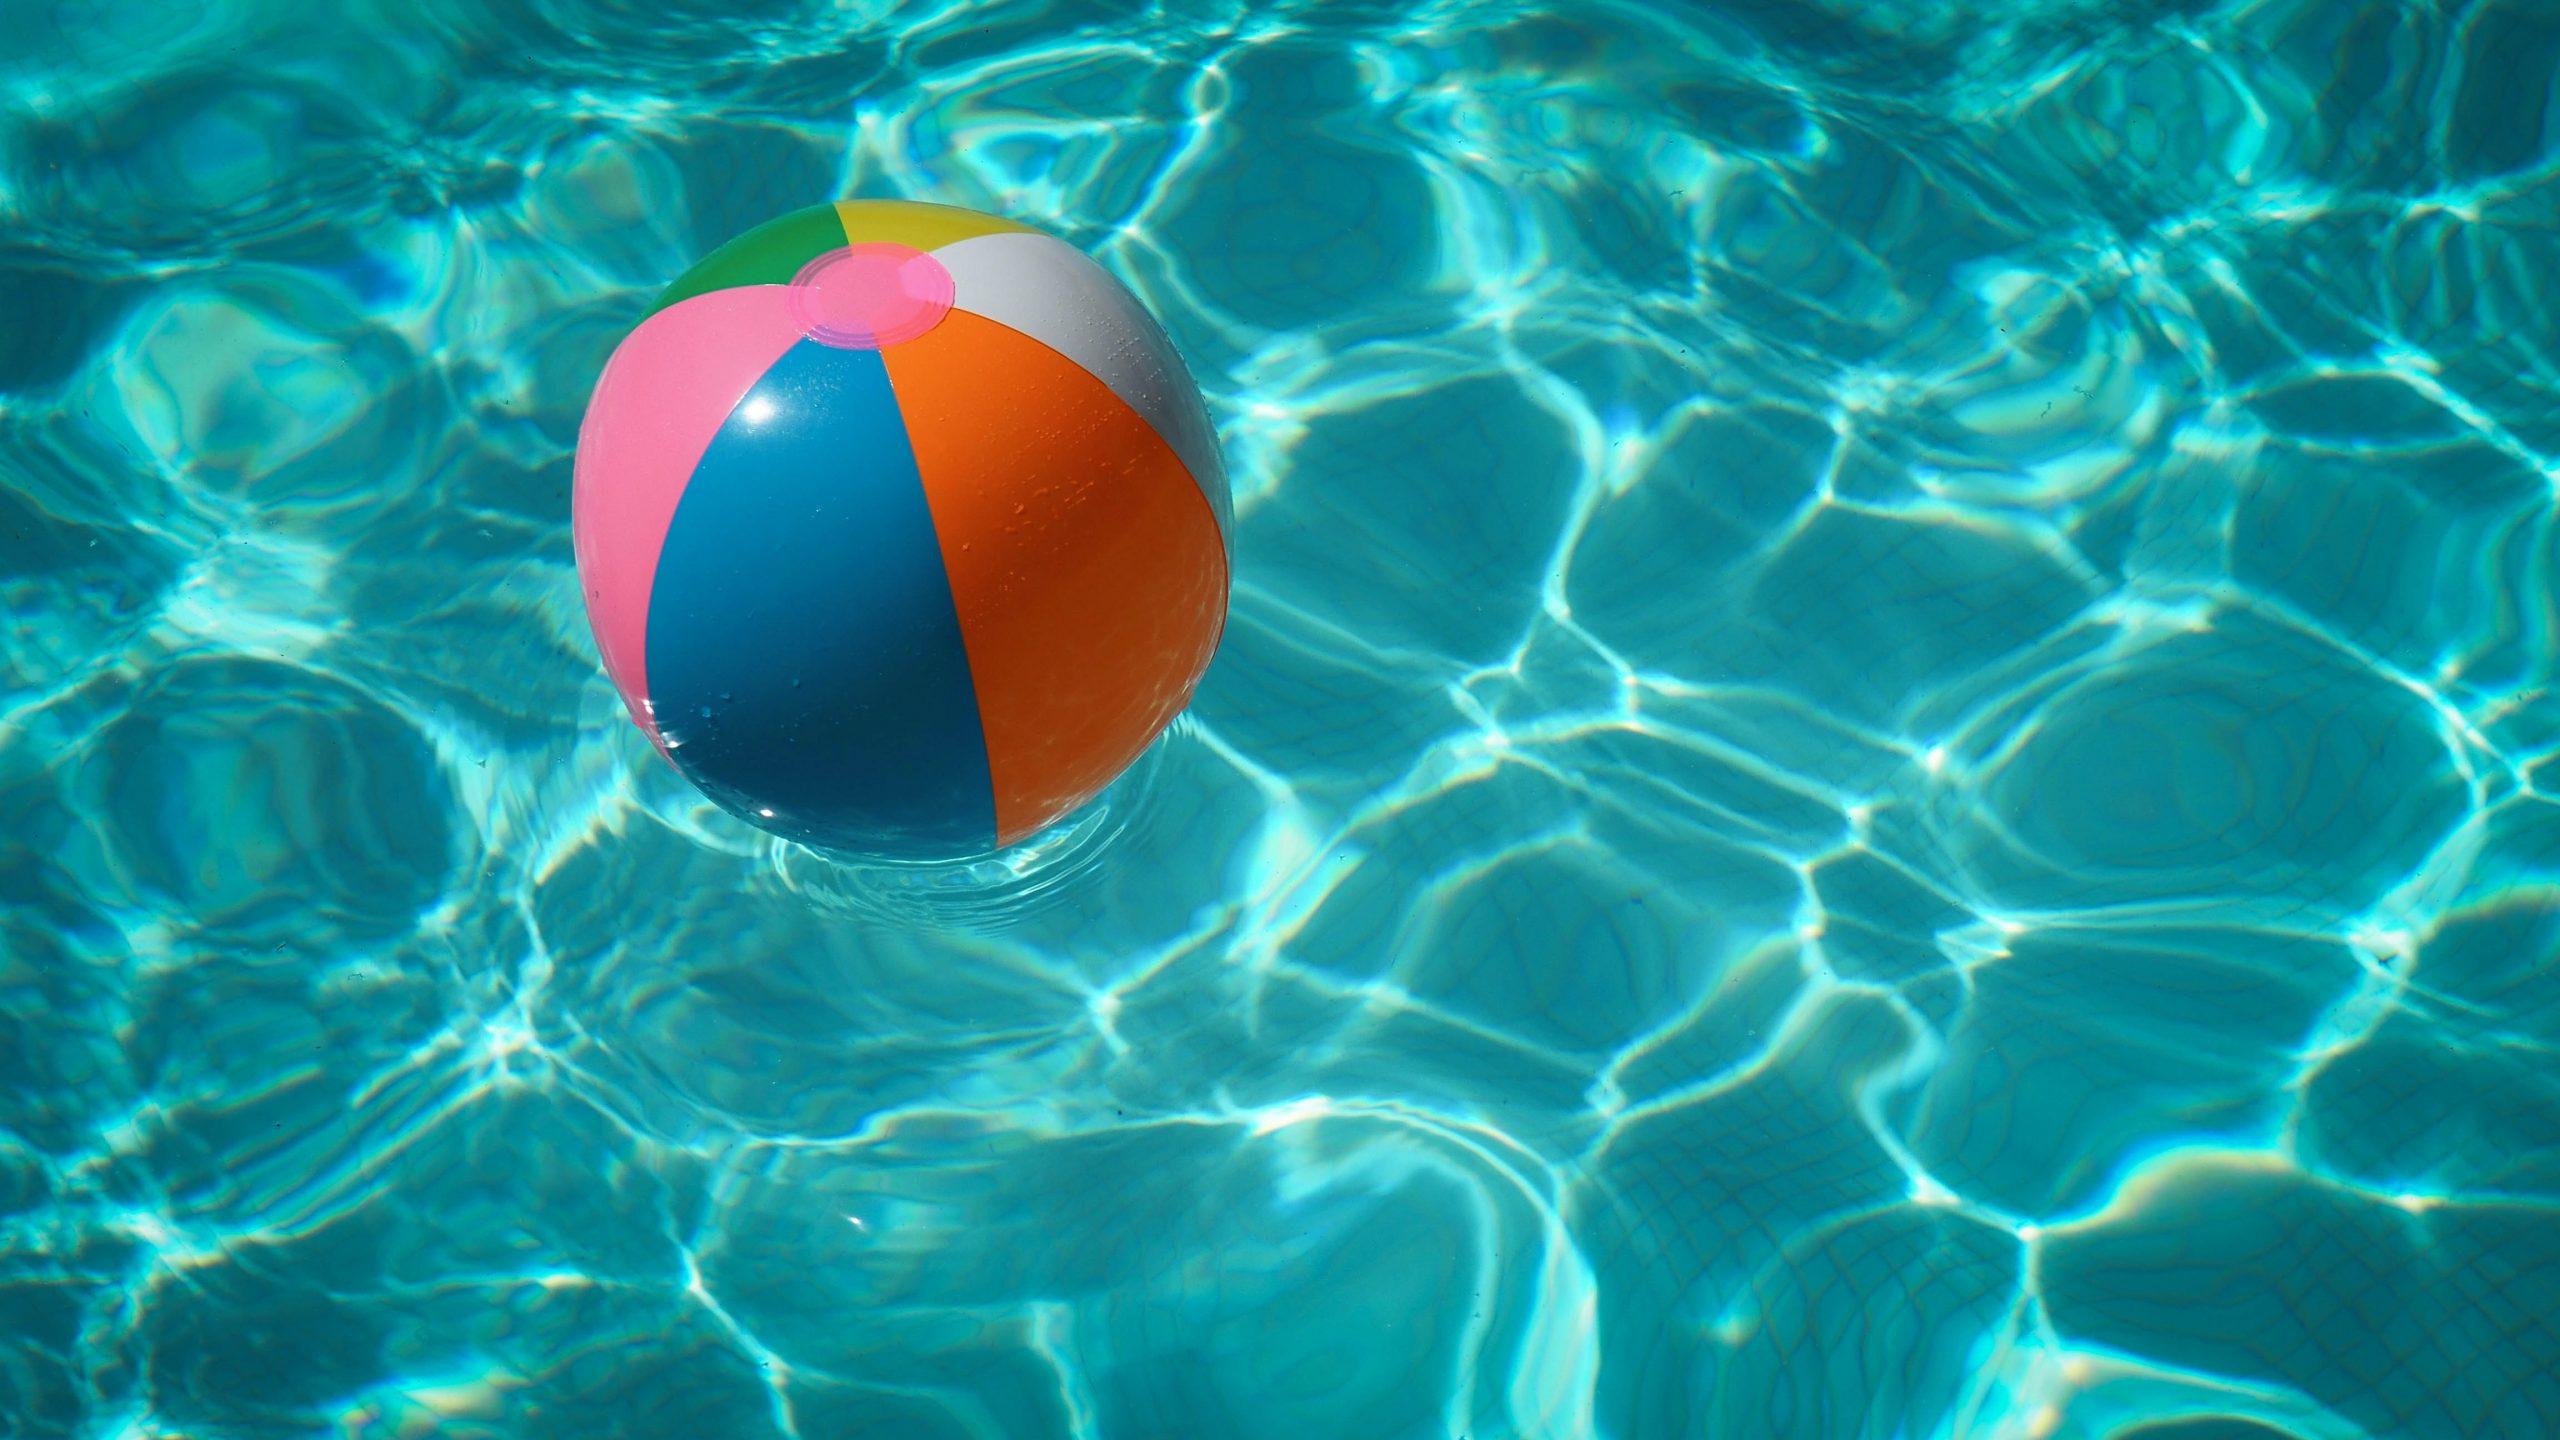 Skal en pool være familiens sommerferieprojekt?